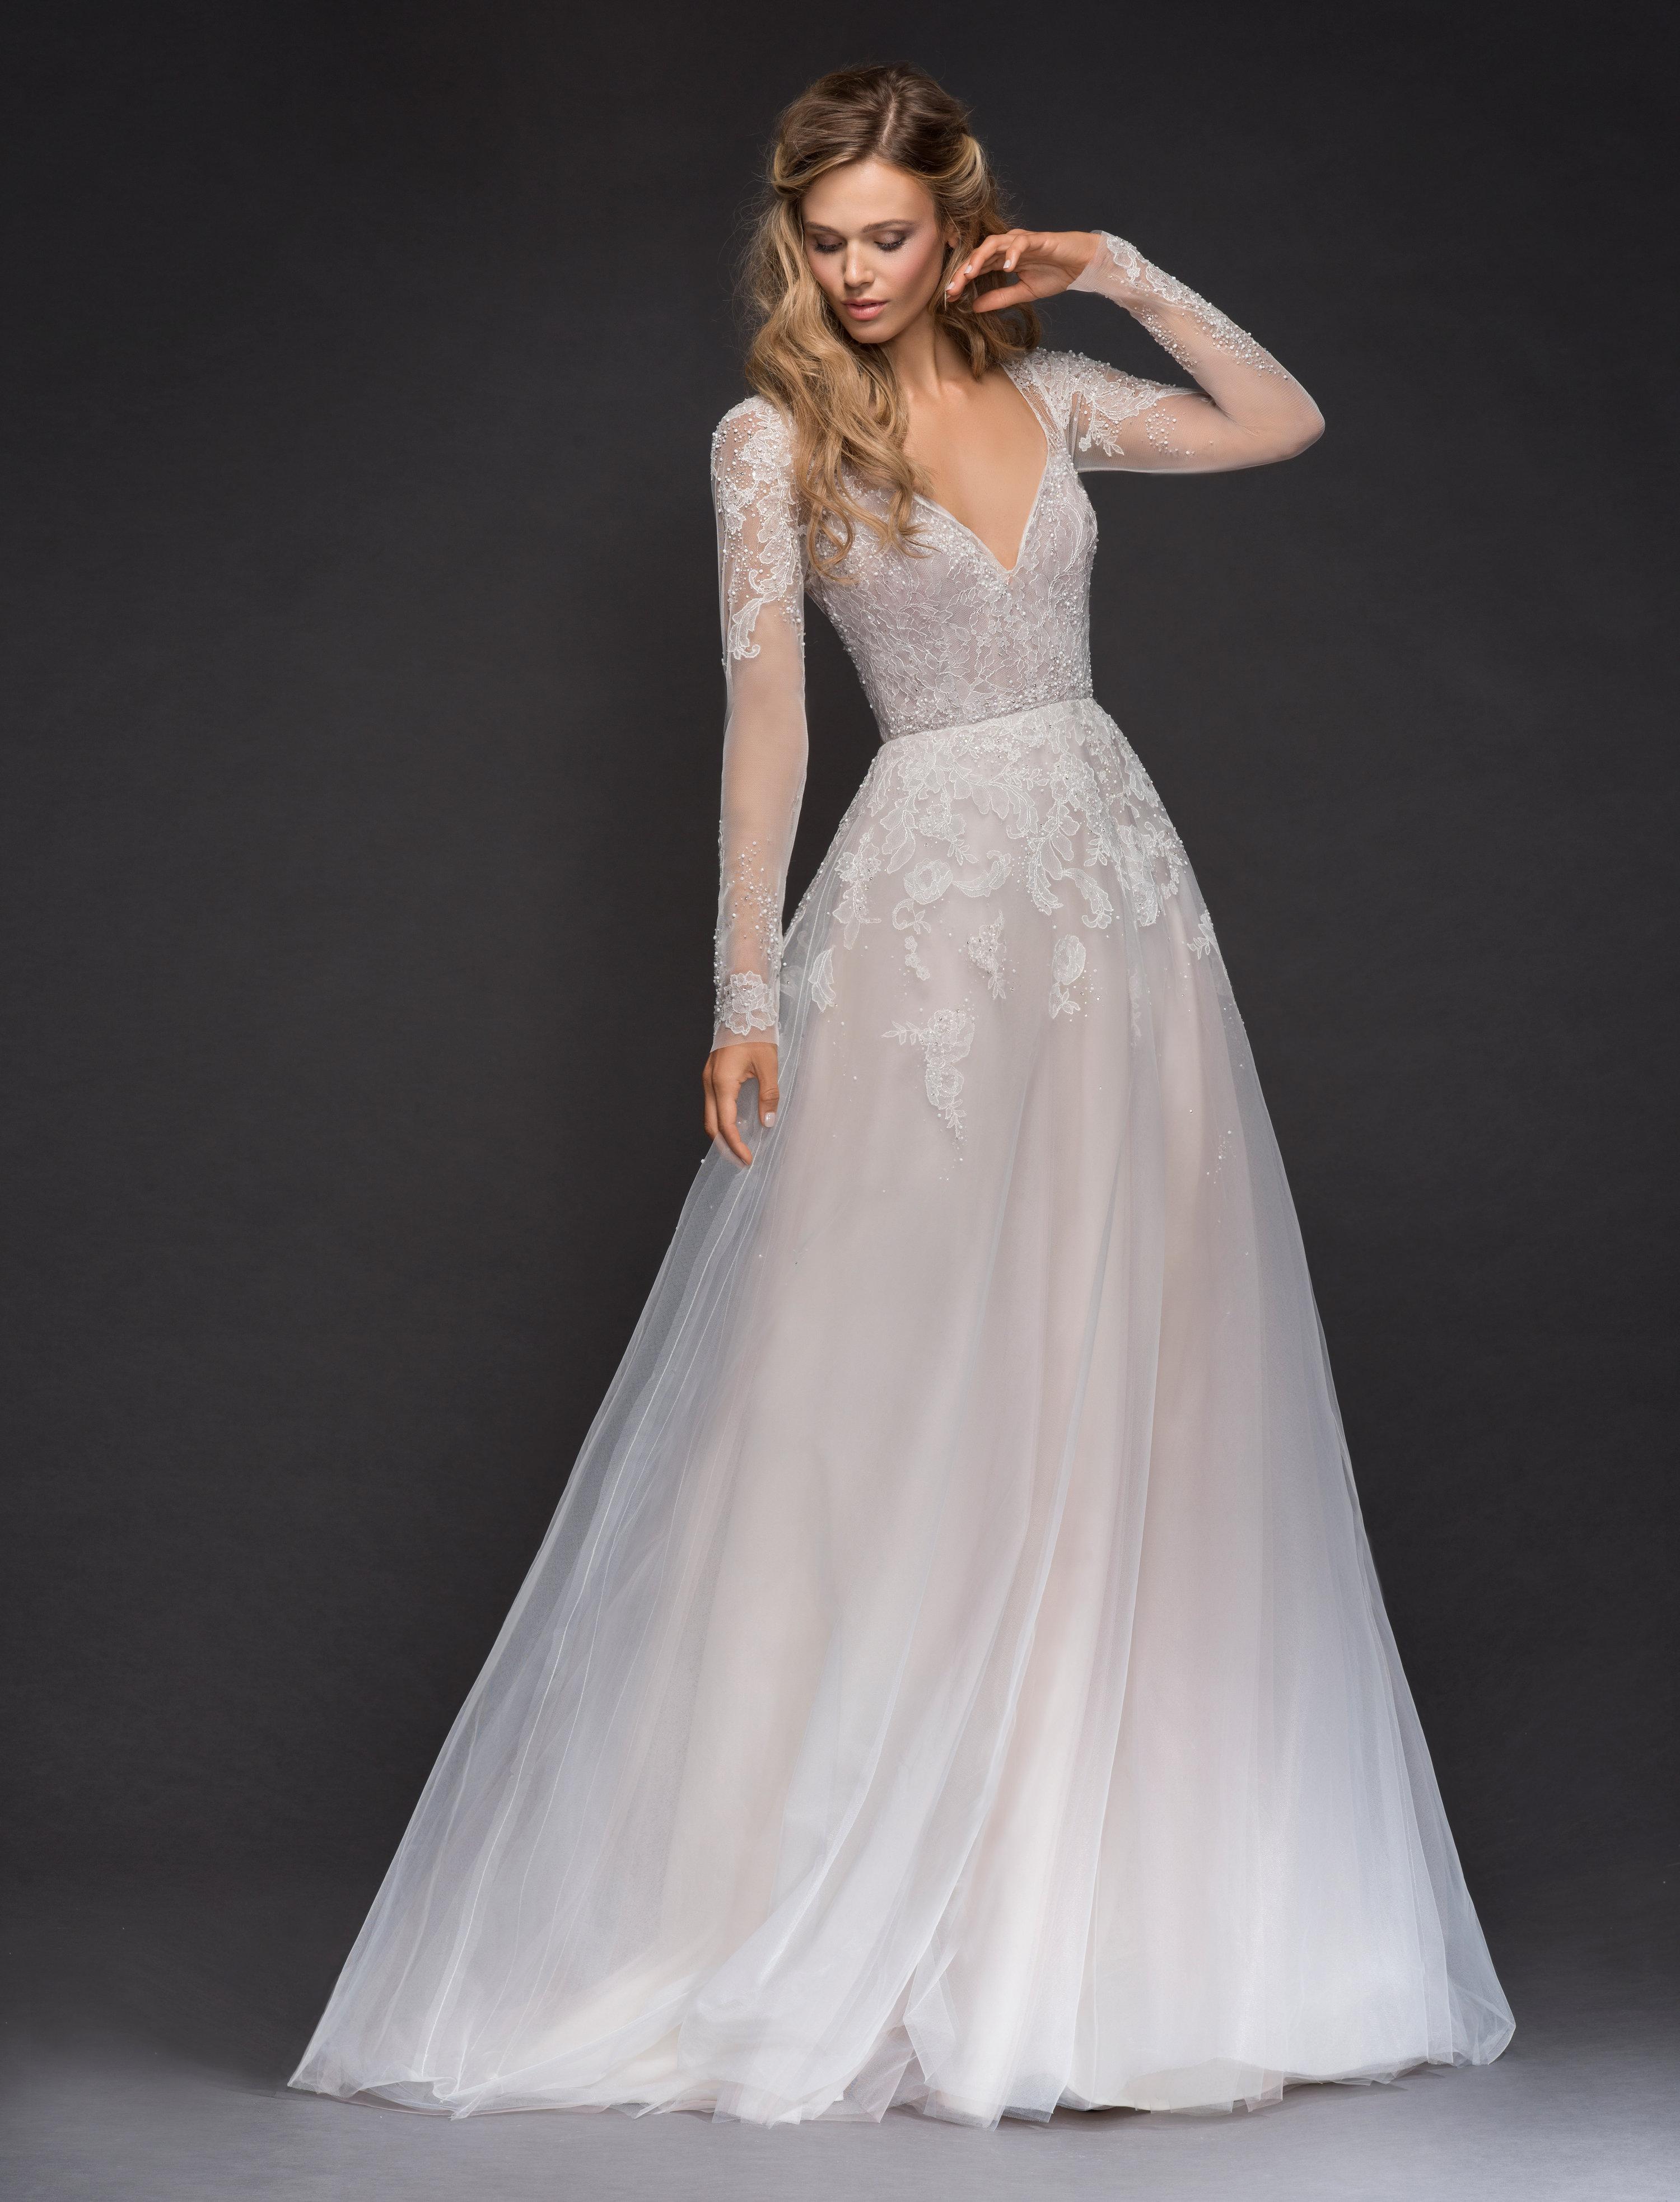 Sweetheart Long Sleeve Beaded Lace A-lne Wedding Dress | Kleinfeld ...